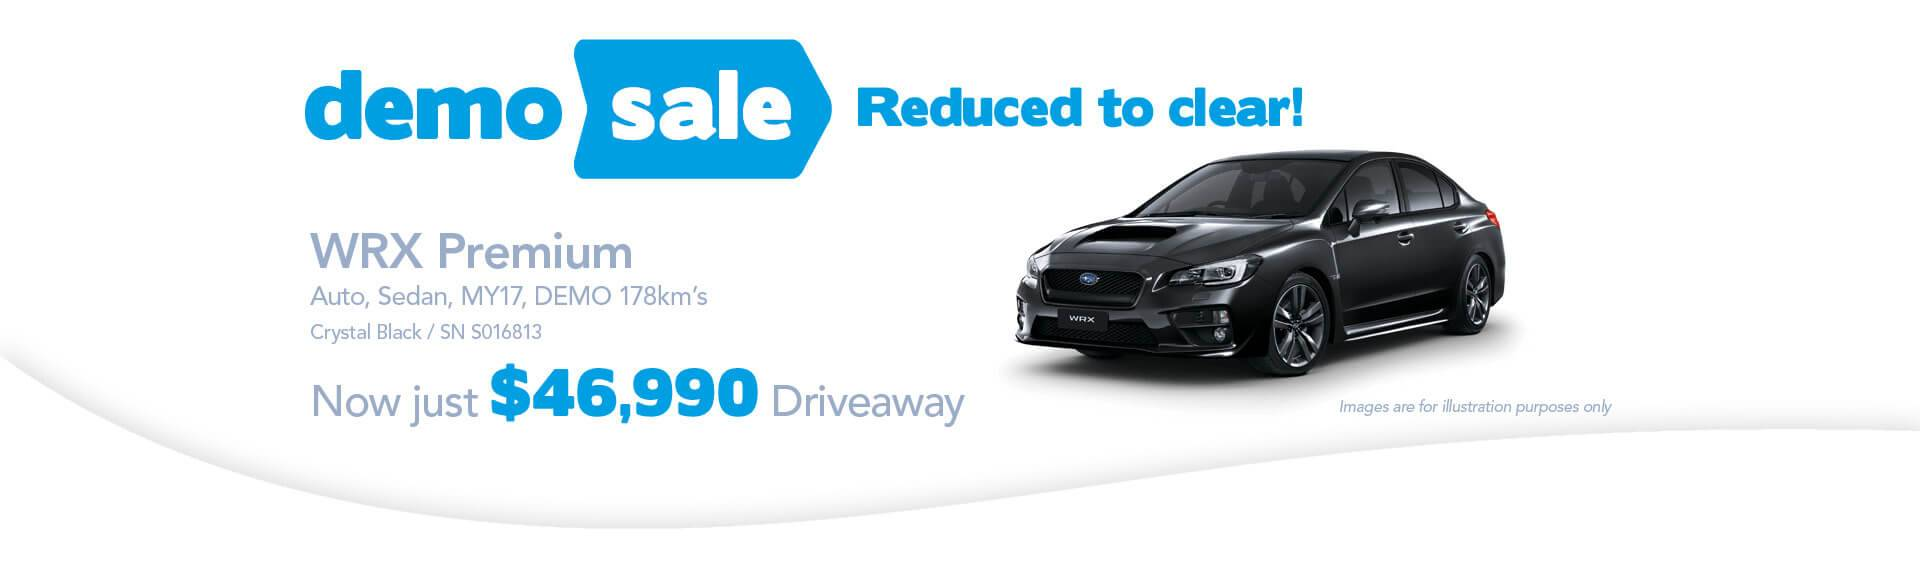 Newcastle City Subaru- WRX Demo Sale